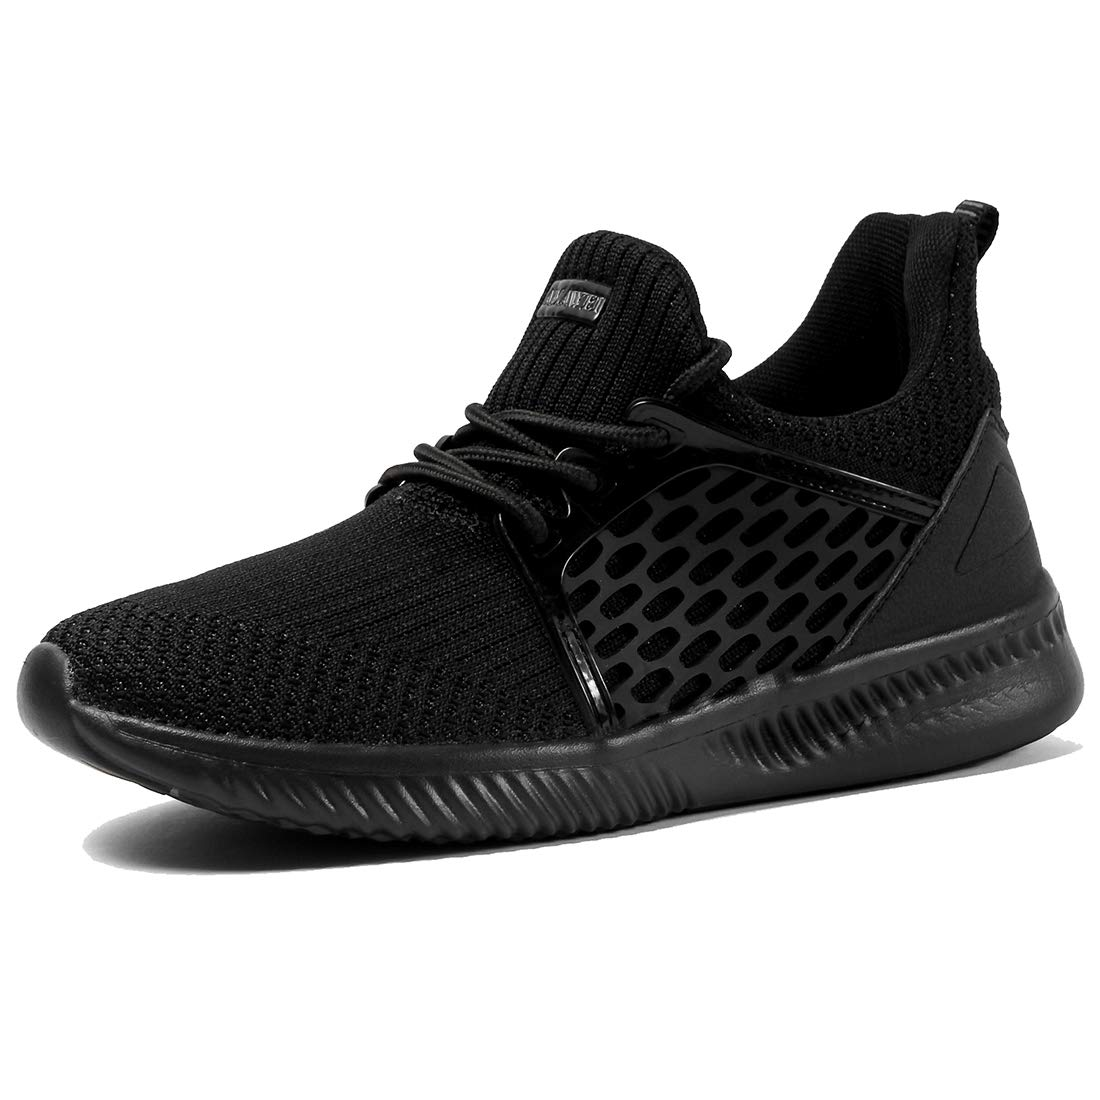 Dian Sen Boys Girls School Sneakers for Kids Casual Athletic Tennis Walking Running Shoes